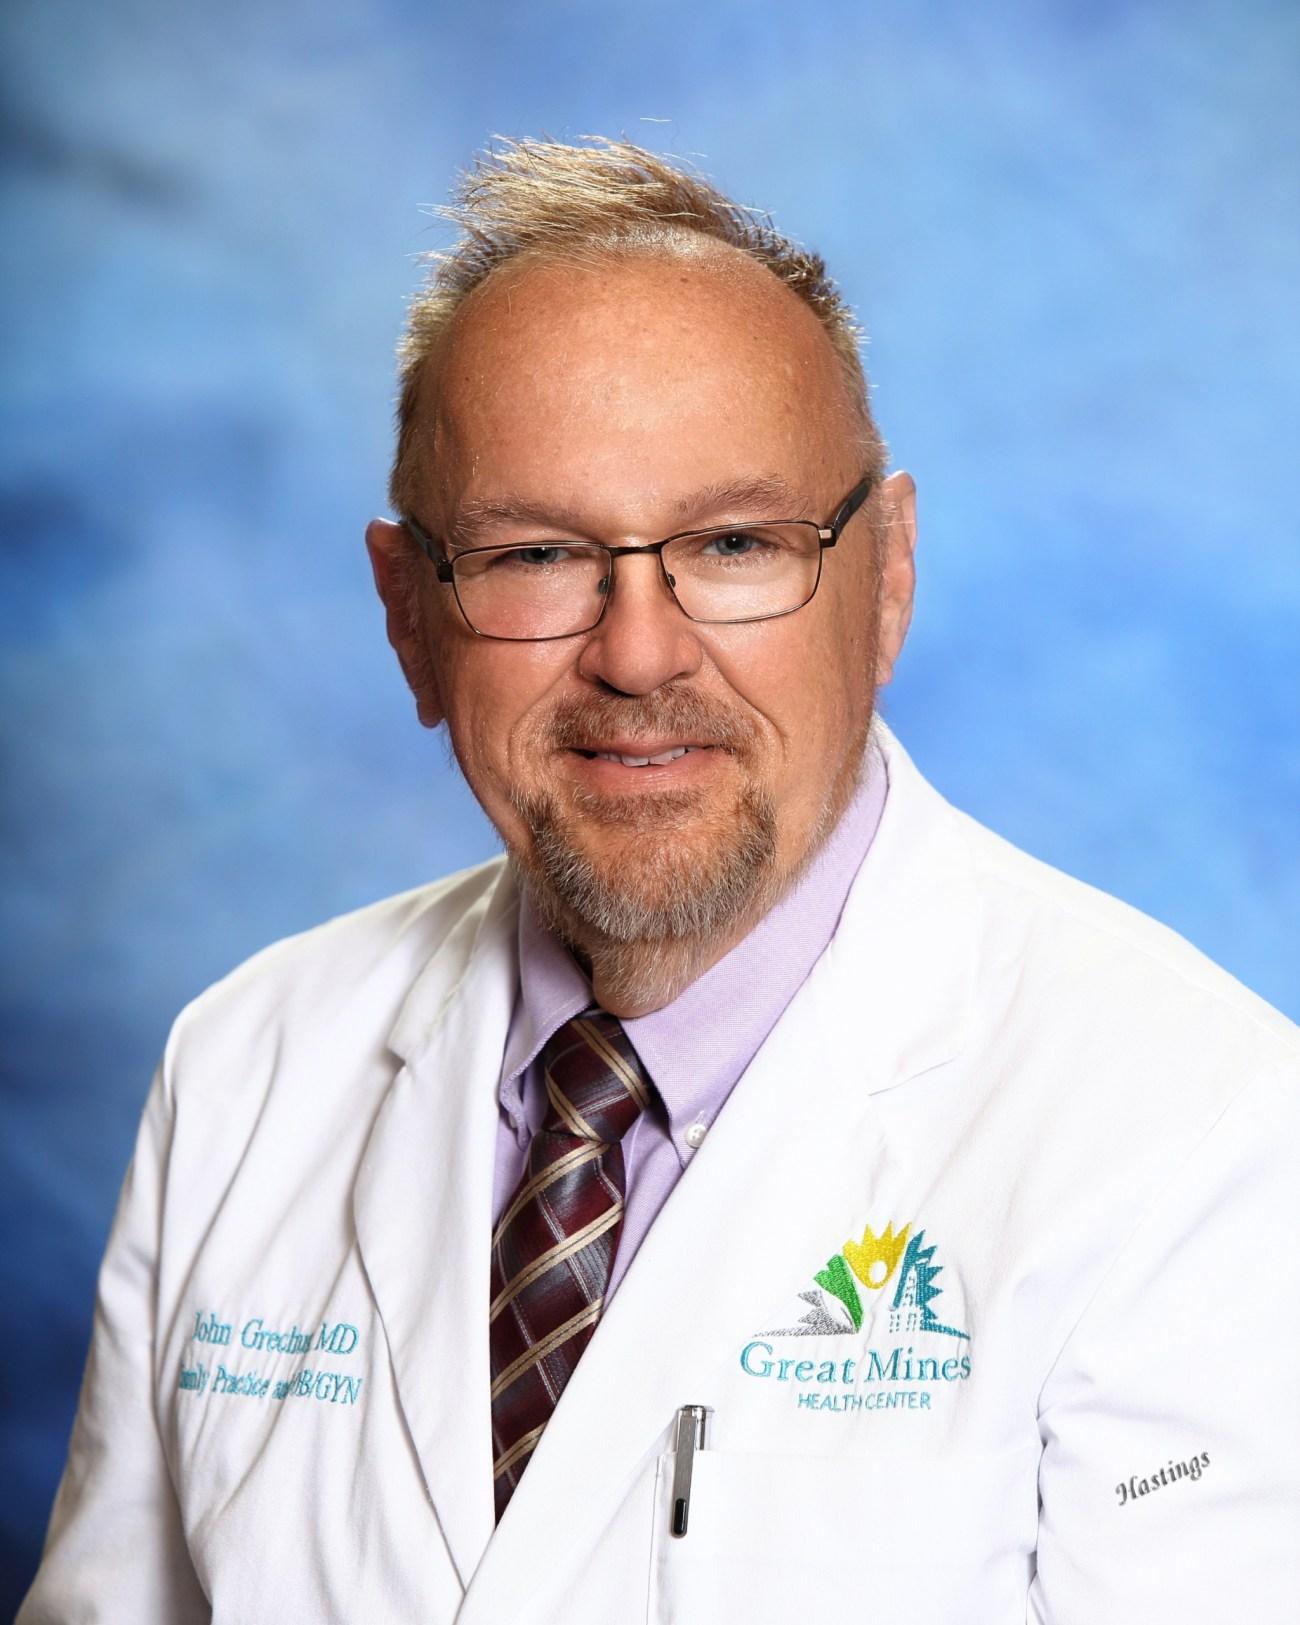 Dr. John Grechus, M.D.